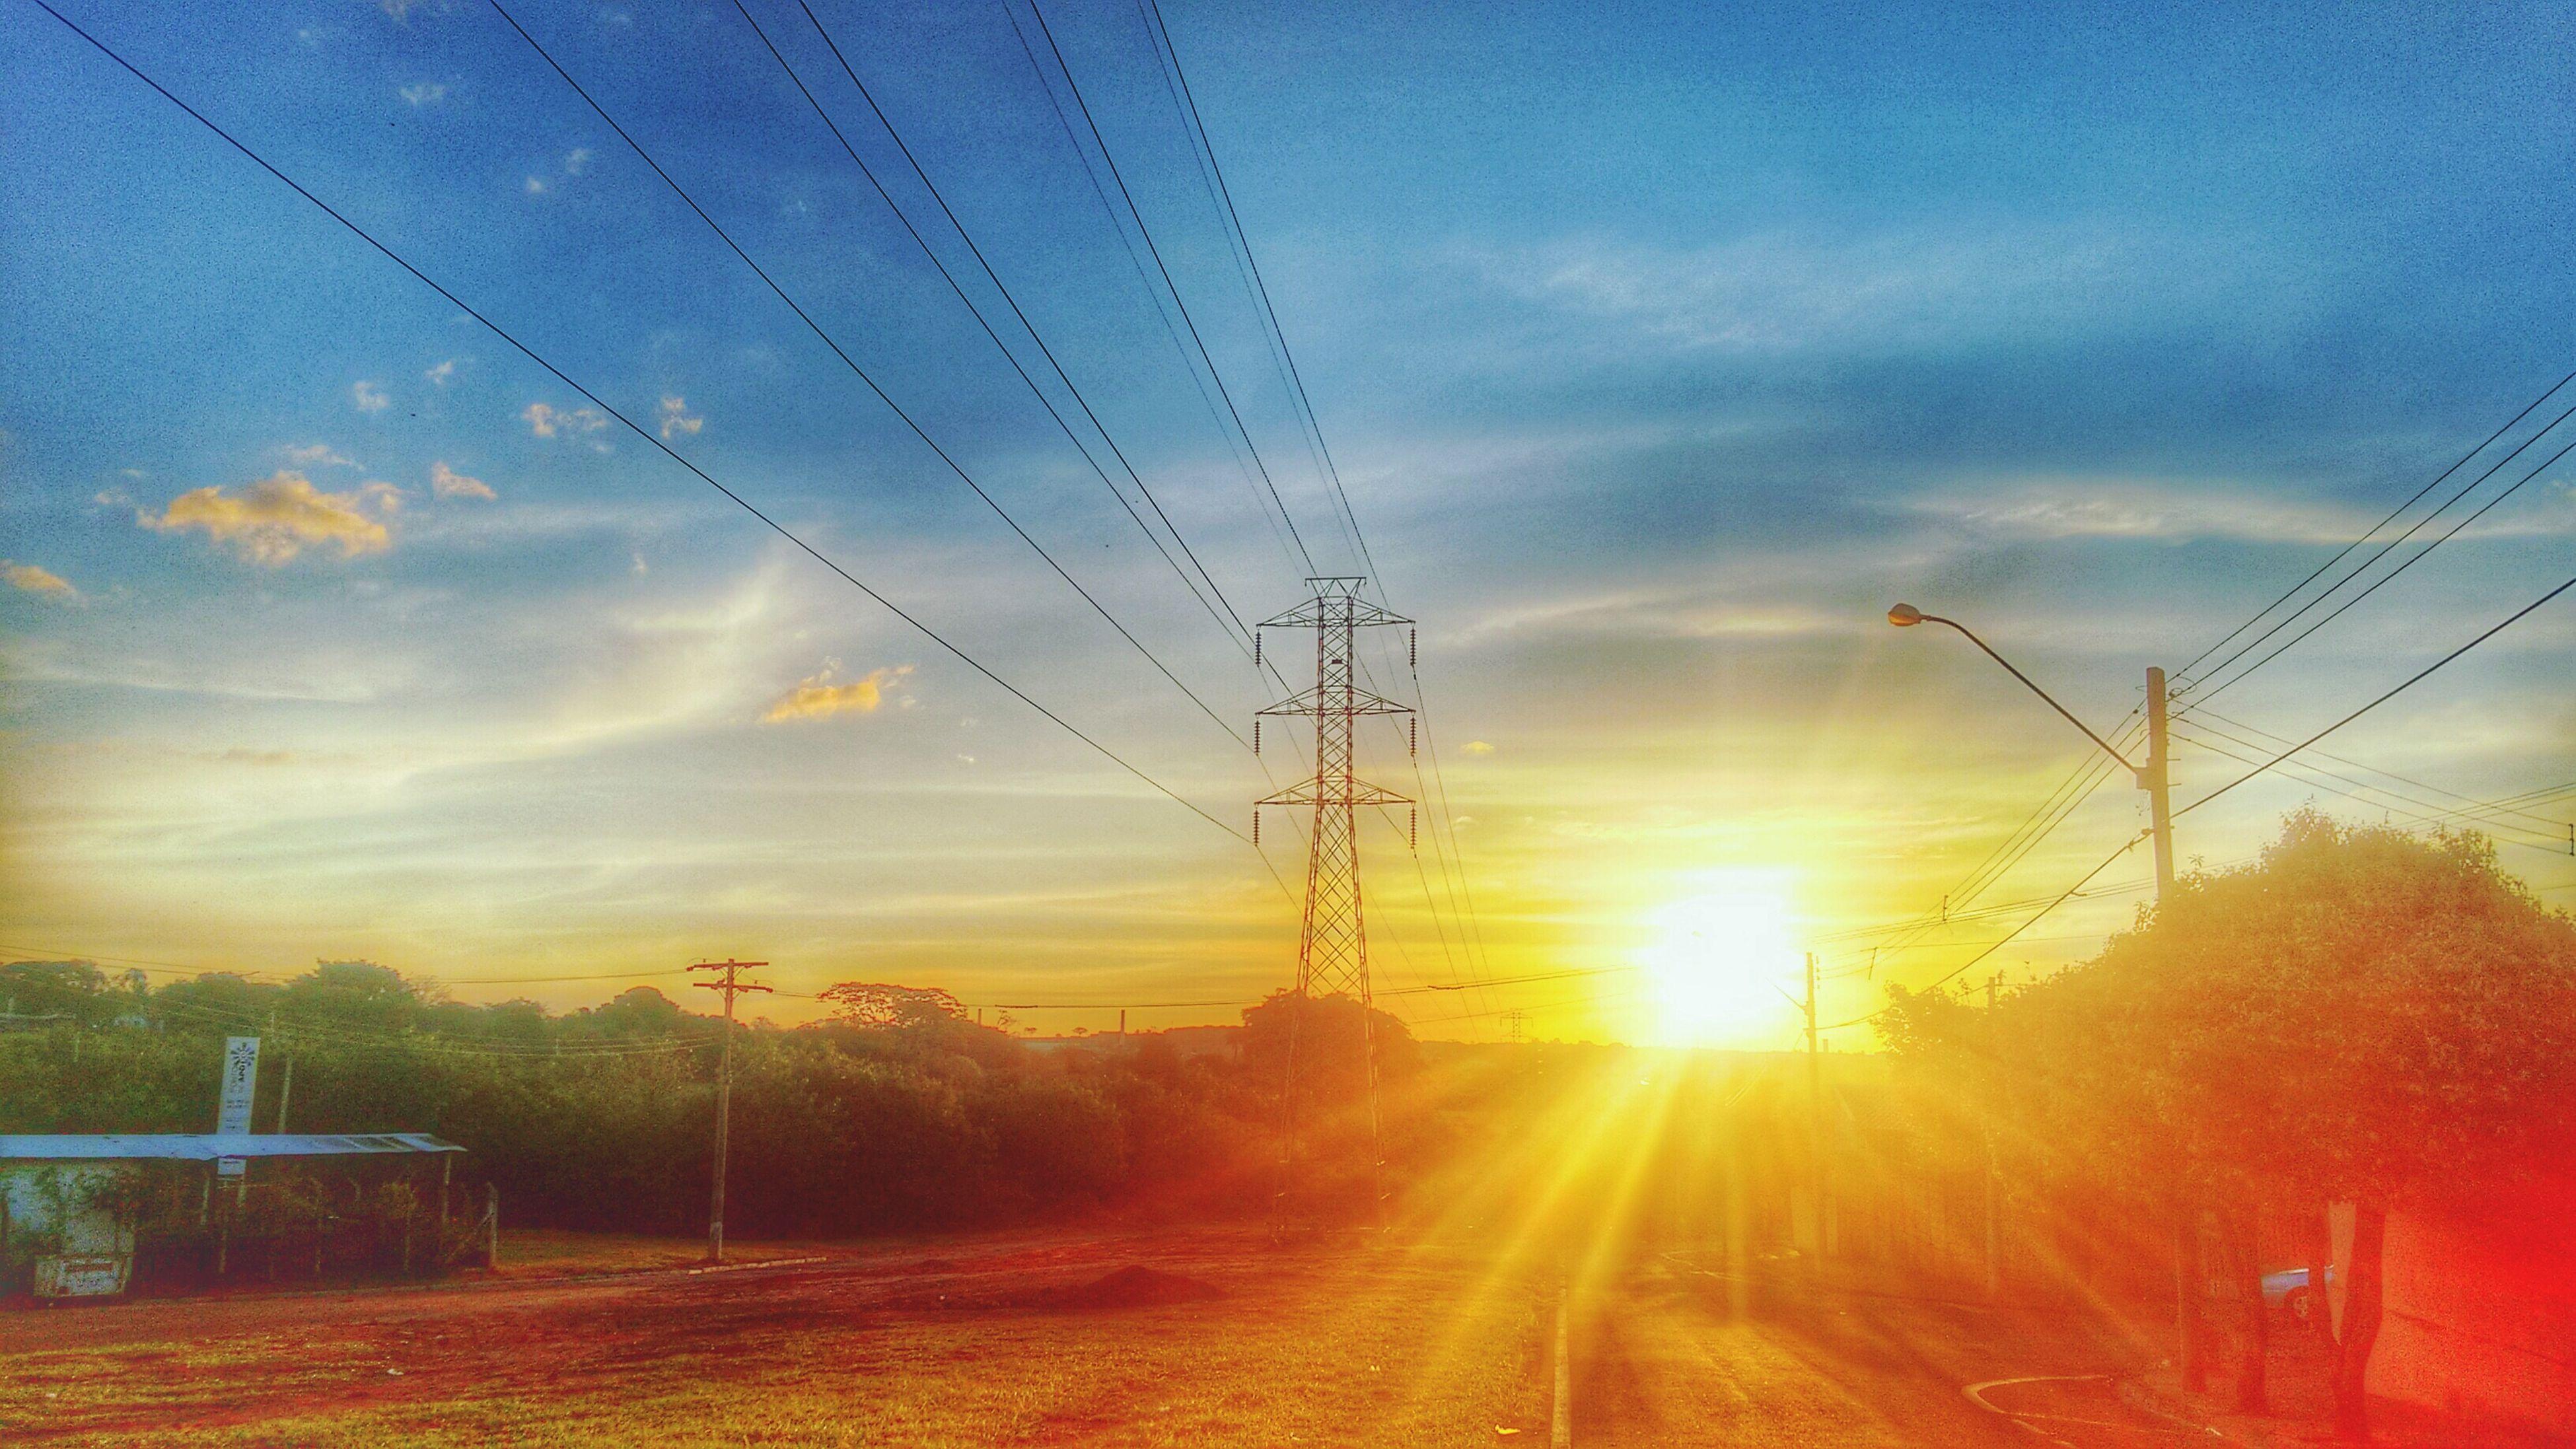 power line, electricity pylon, sky, sunset, electricity, power supply, cloud - sky, sun, cable, landscape, cloud, connection, fuel and power generation, nature, orange color, field, transportation, tranquility, power cable, sunlight